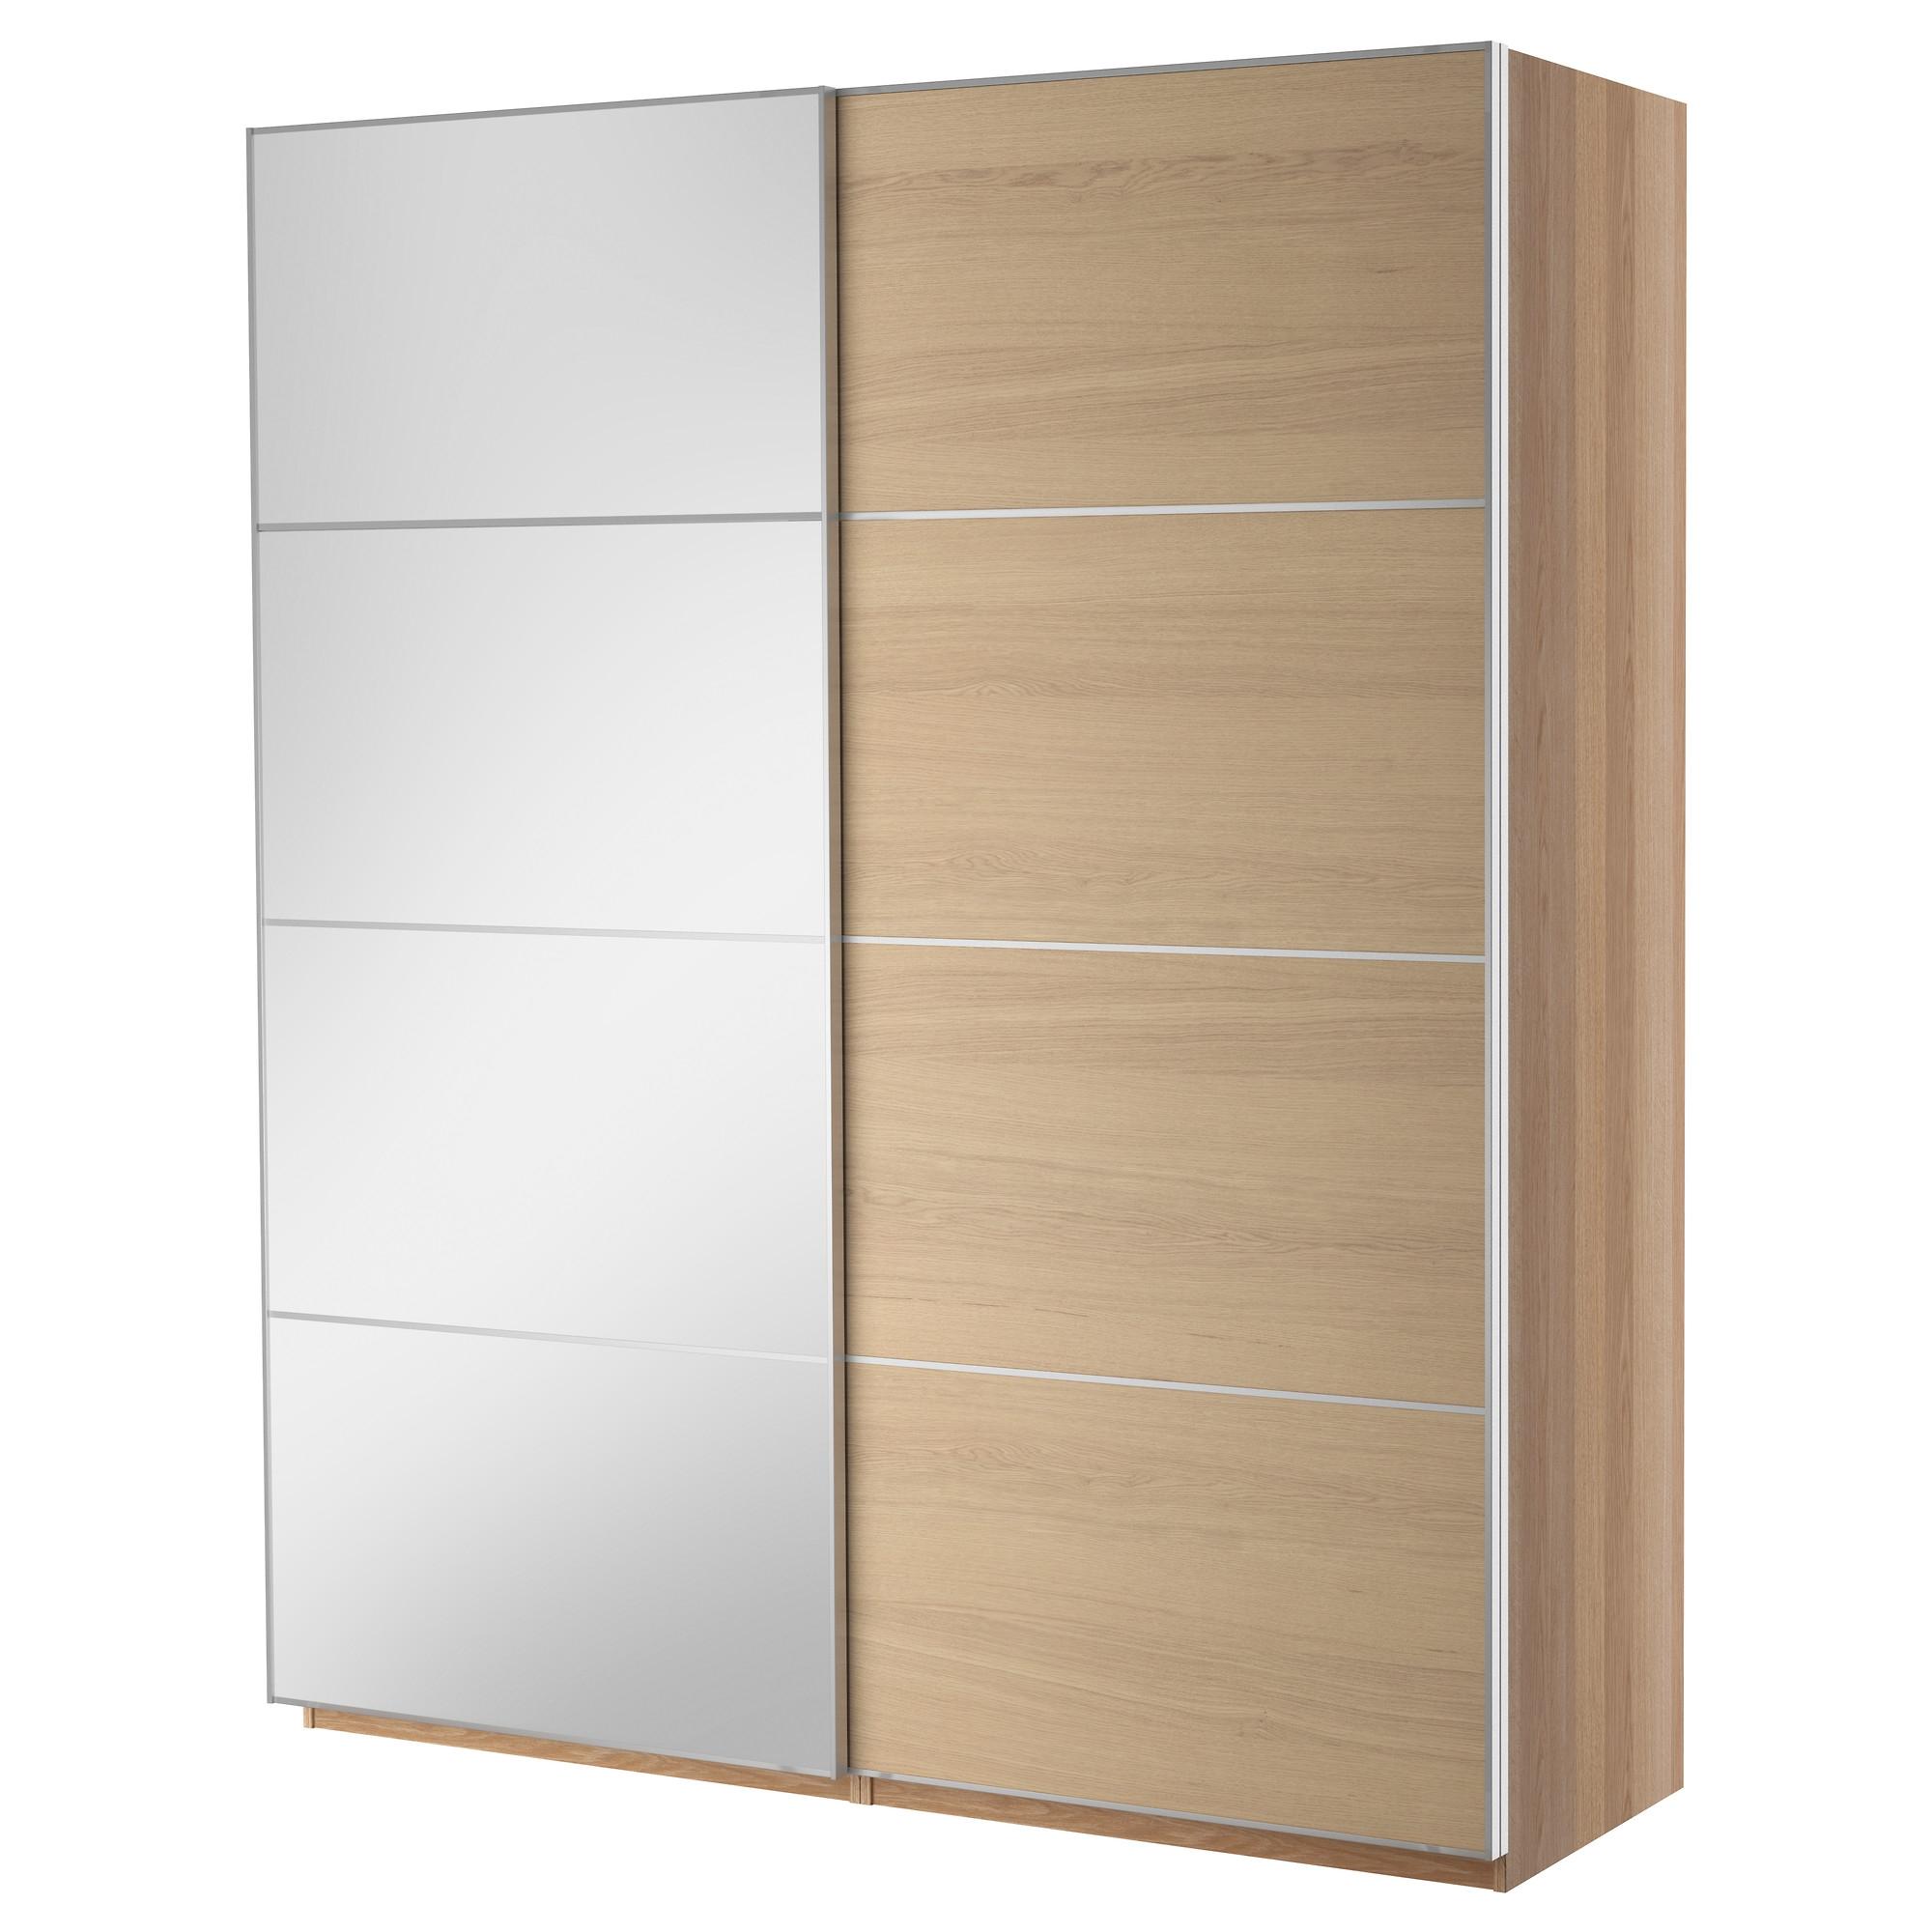 Pax wardrobe with sliding doors - Apliques exterior ikea ...